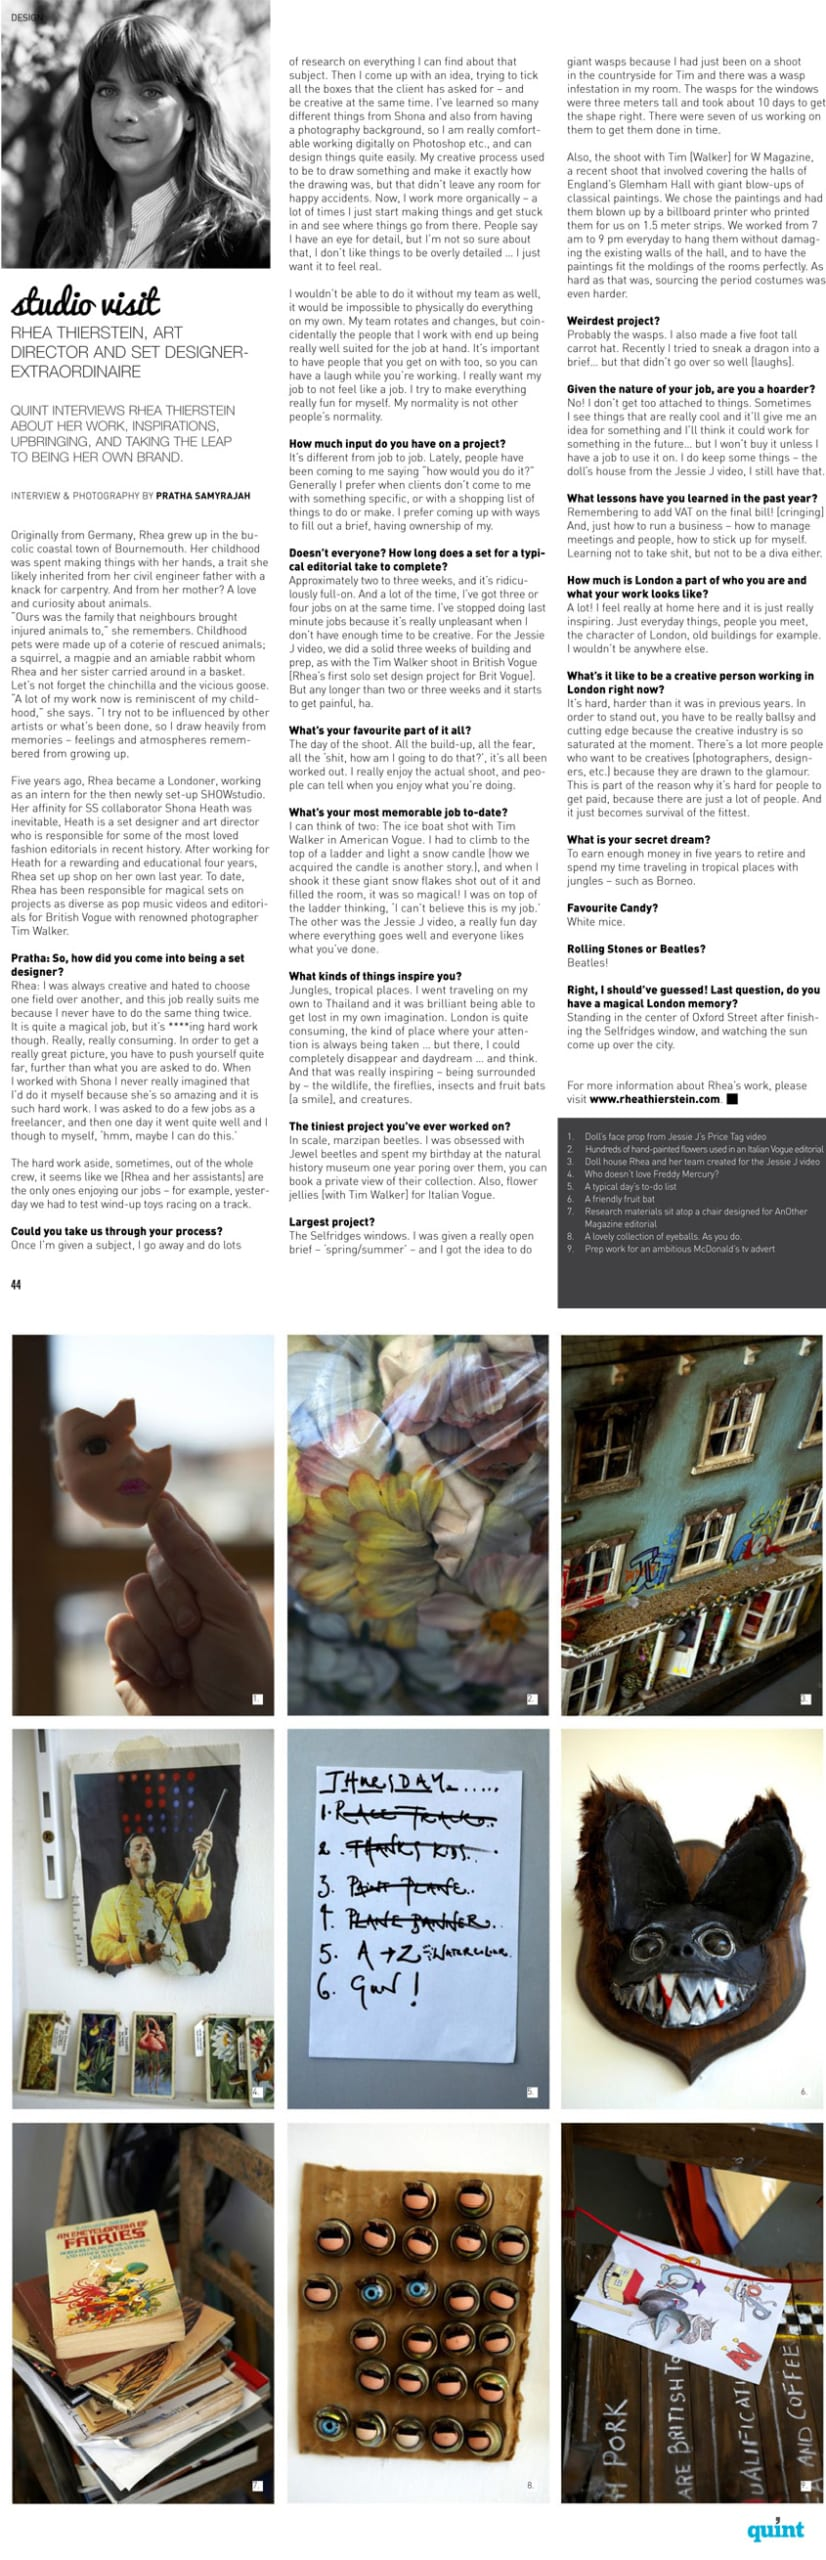 Quint Magazine Interview